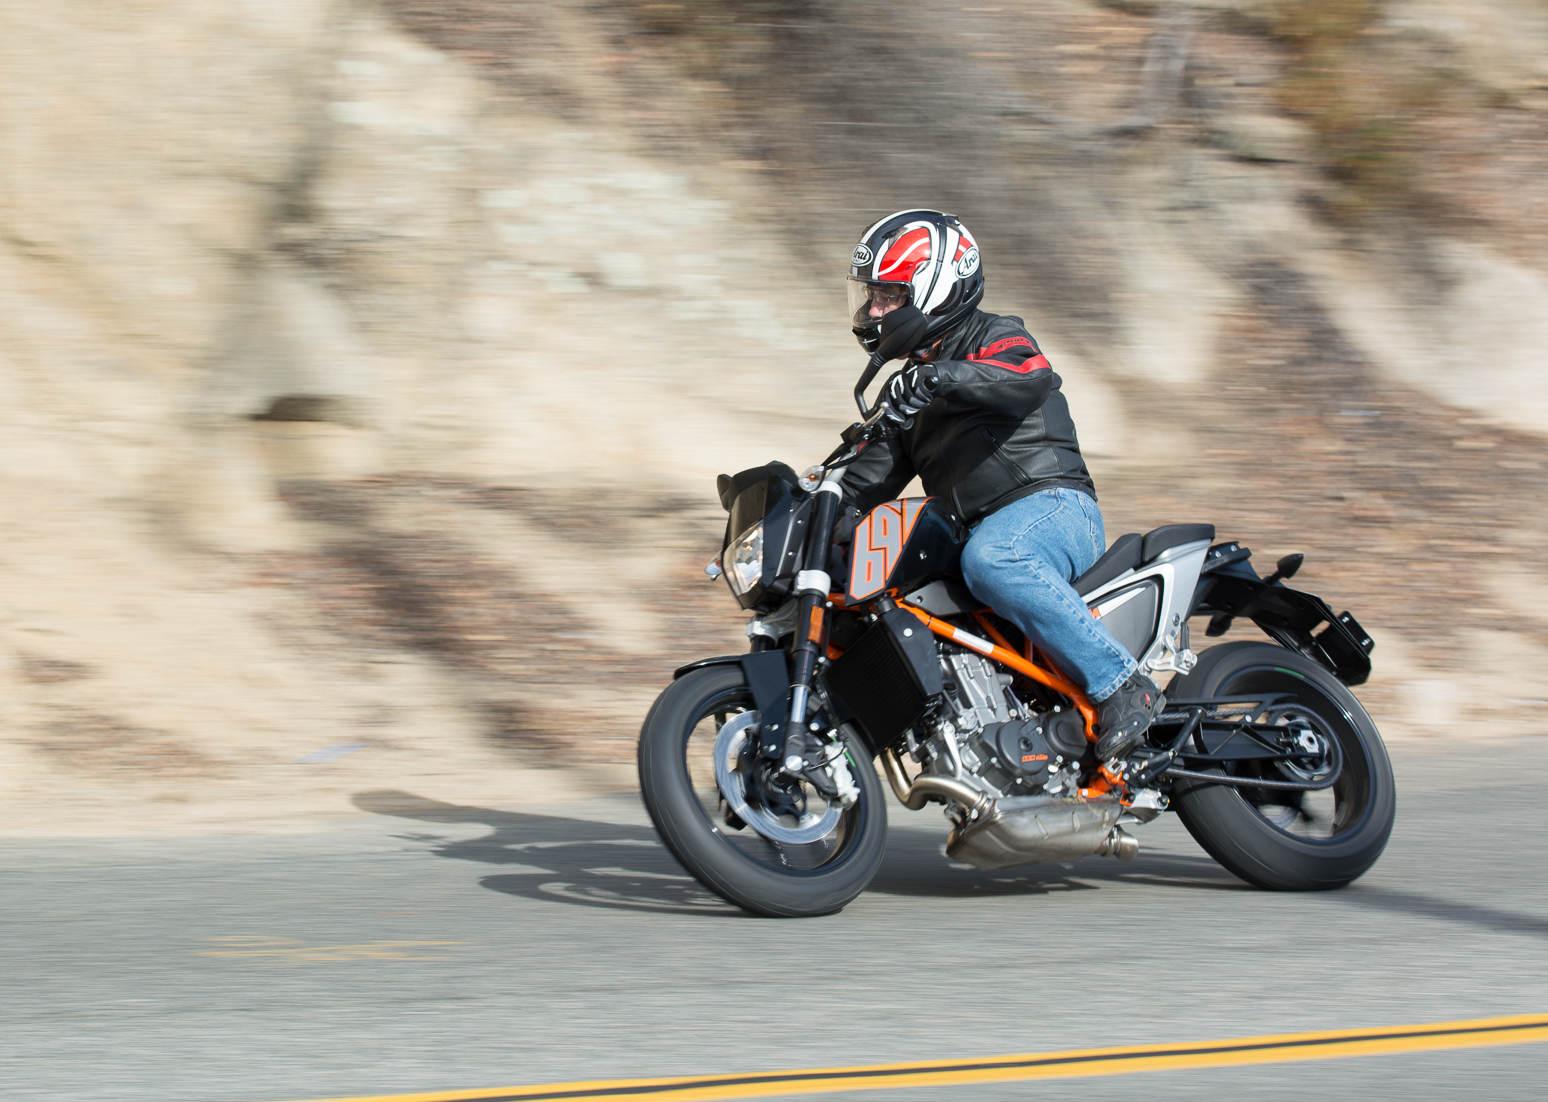 2014 Ktm 690 Duke Md Ride Review Motorcycle 2012 Dr650 Suzuki Wiring Diagram